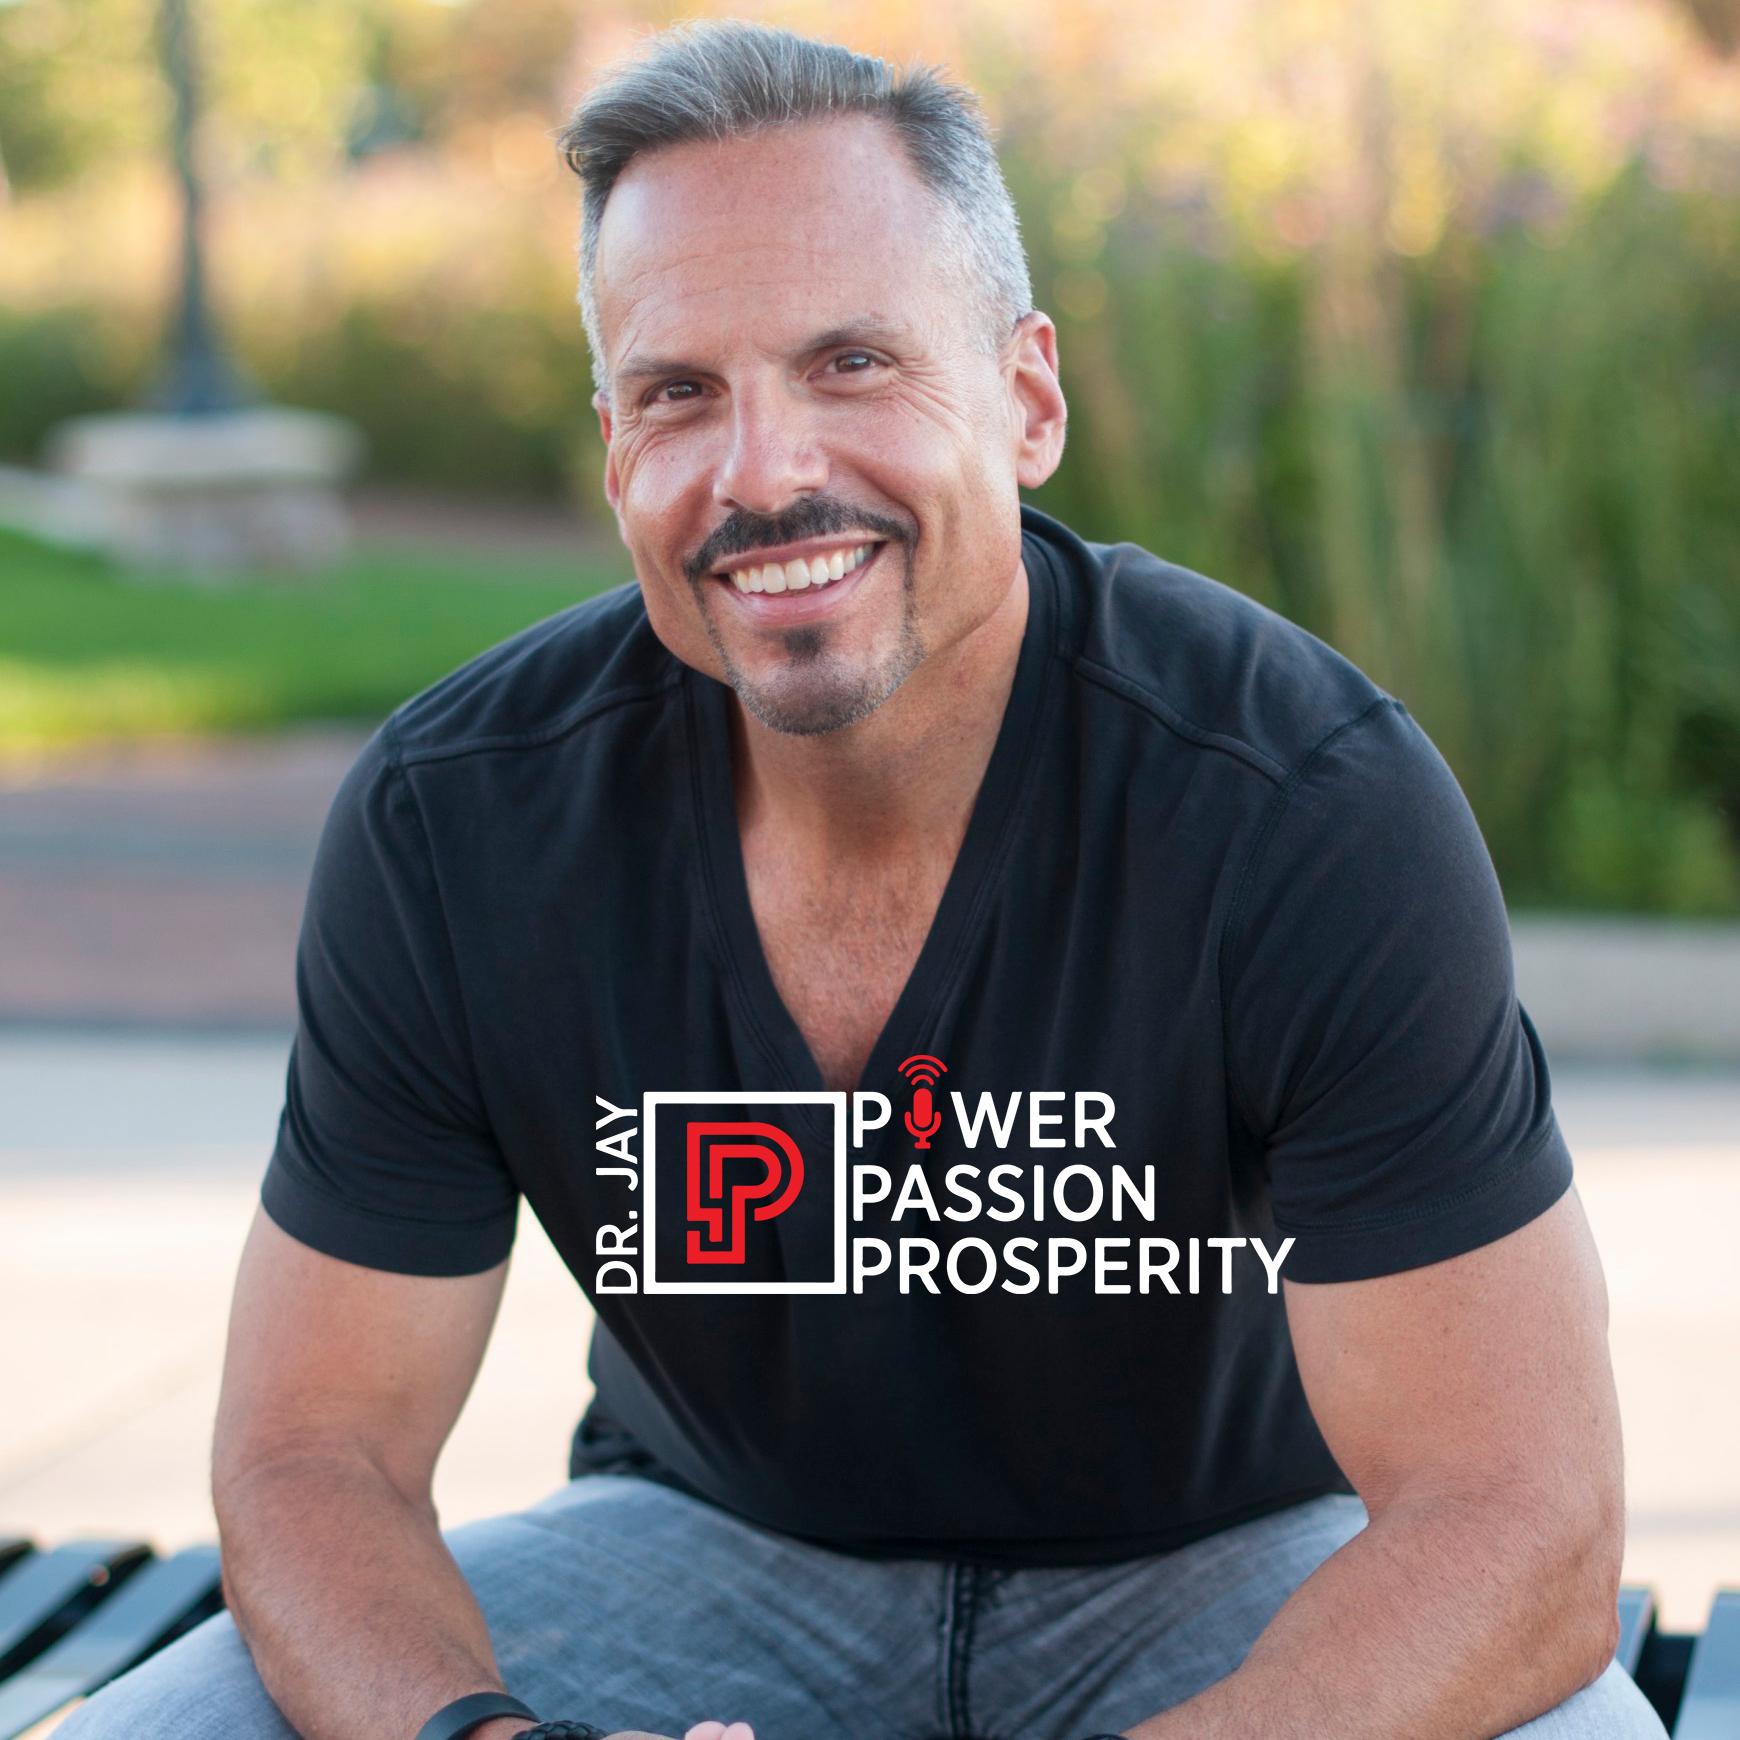 PowerPassionProsperity Podcast w/Dr. Jay show art